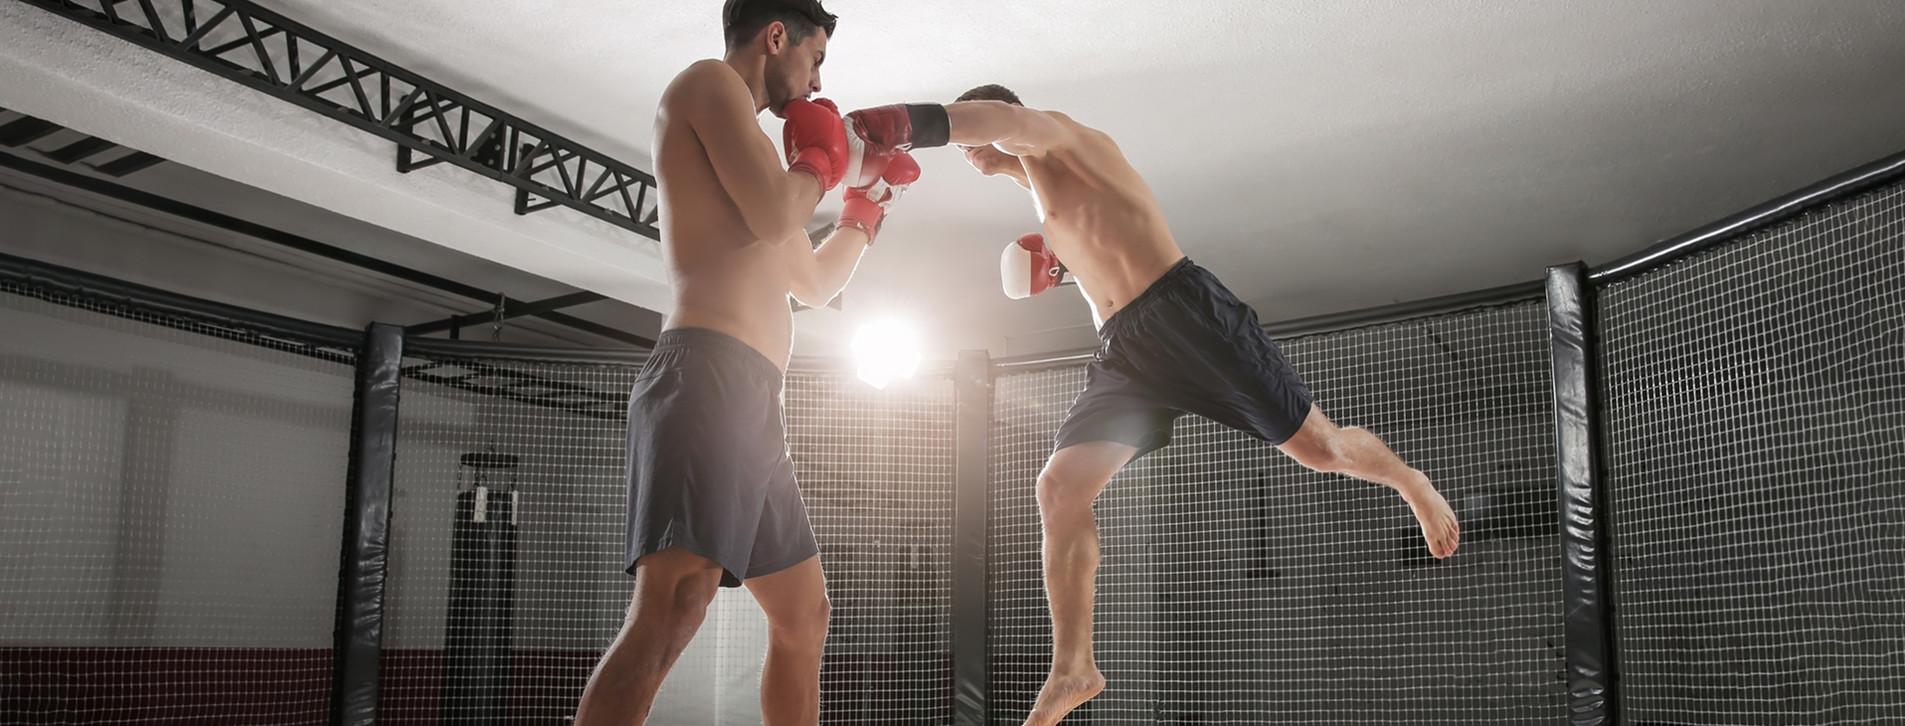 Фото 1 - Курс тренировок по кикбоксингу